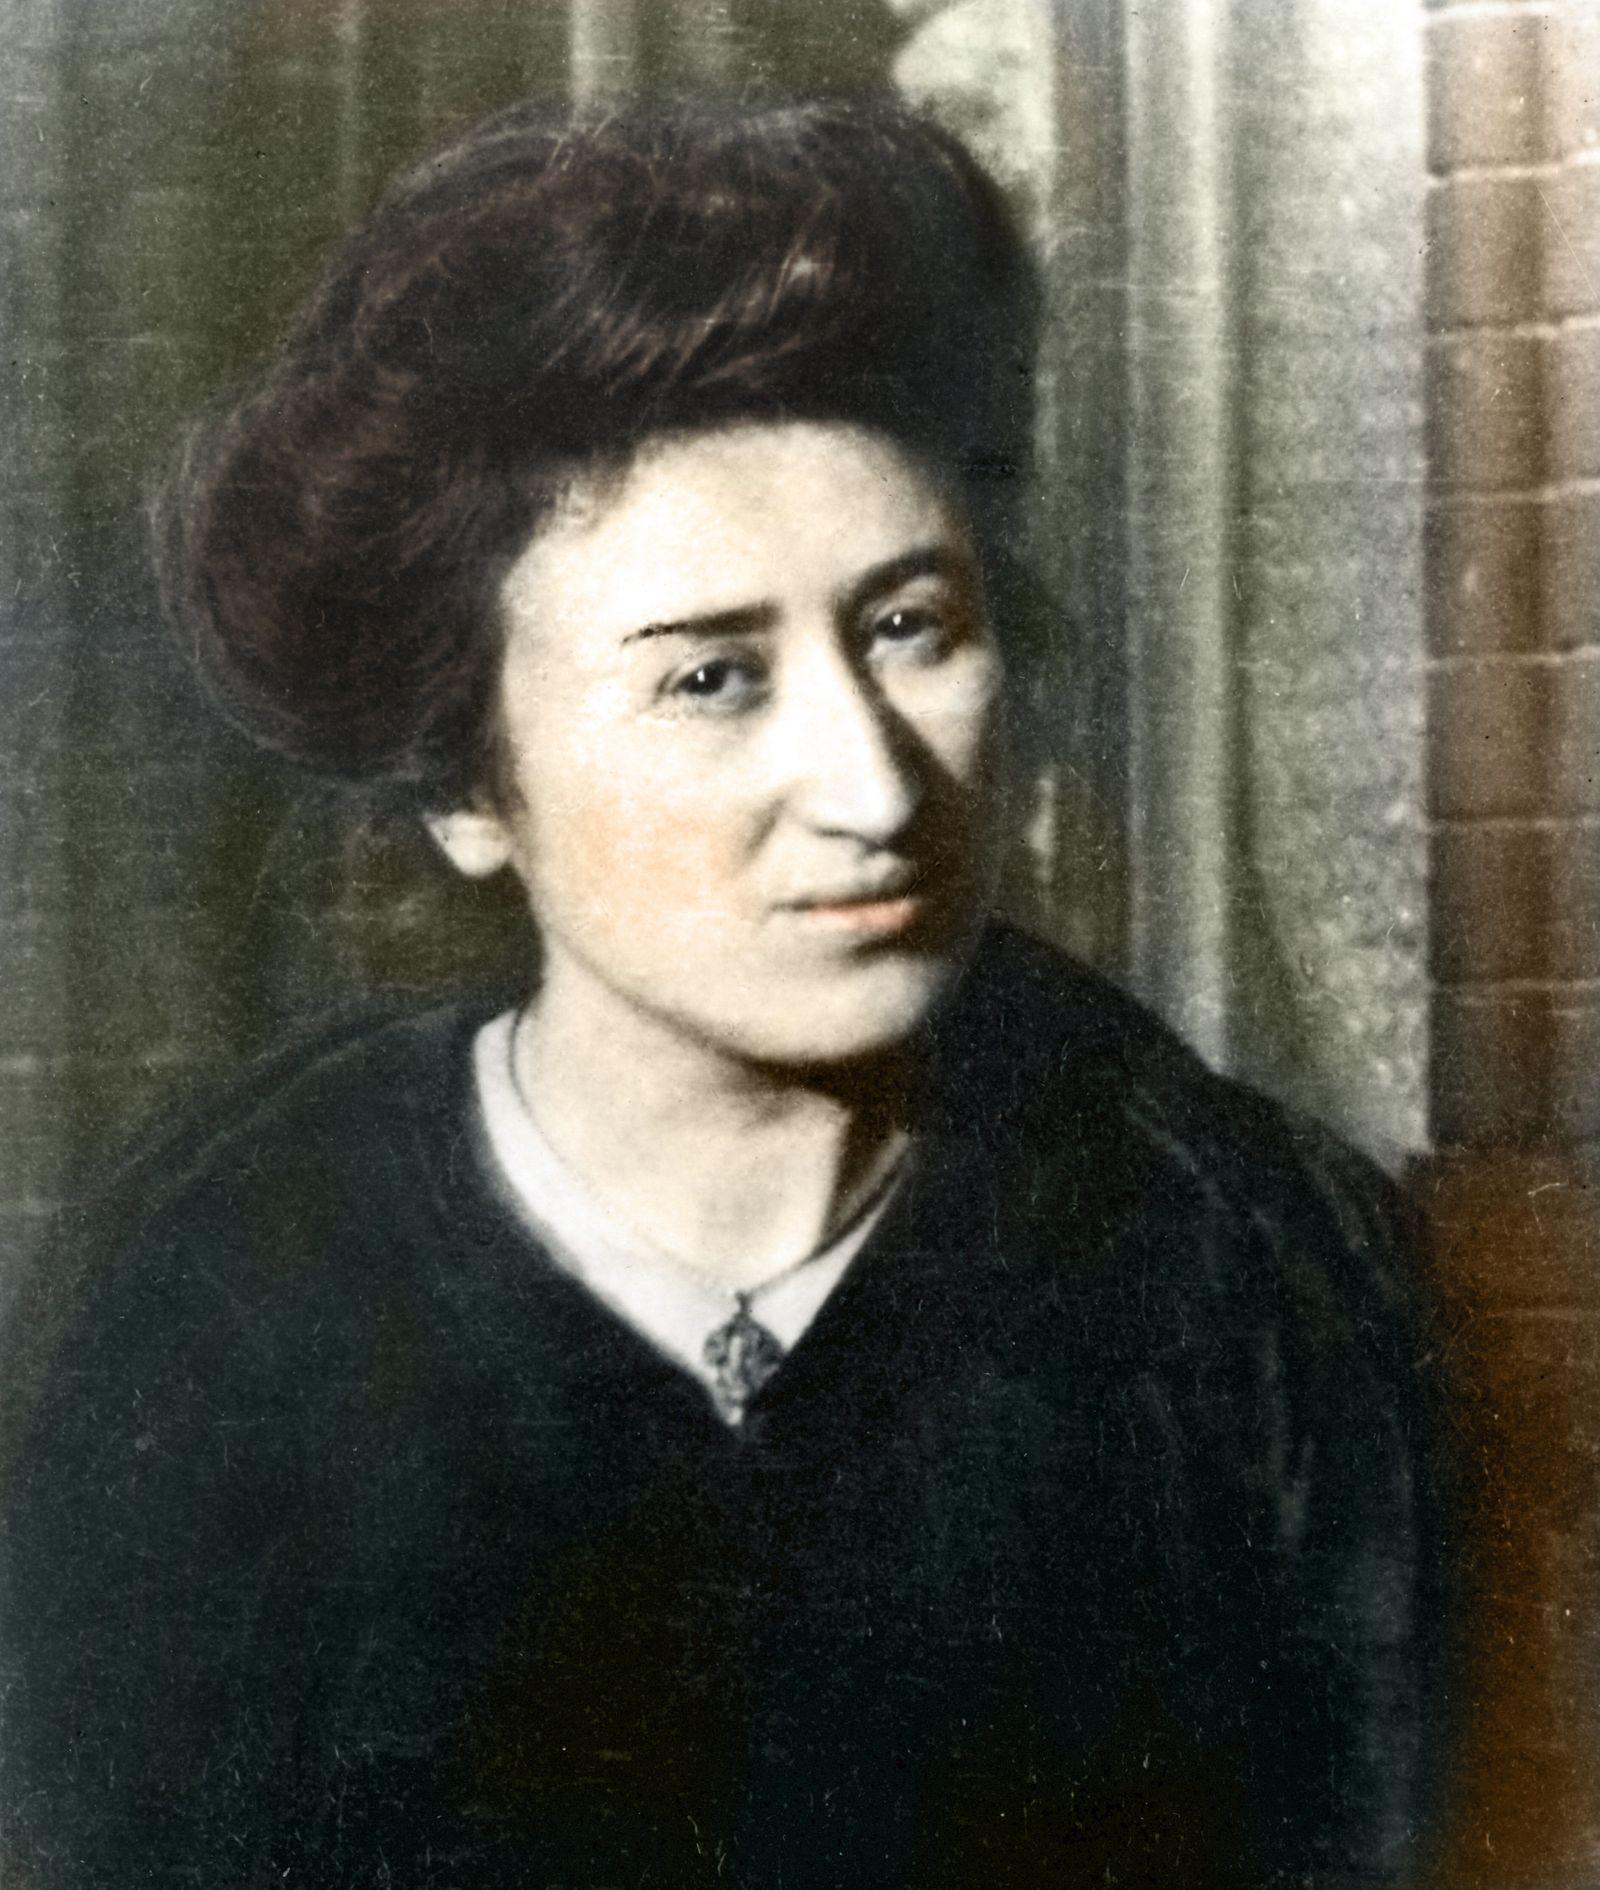 Portrait of Rosa Luxemburg (Rosa Luxembourg)